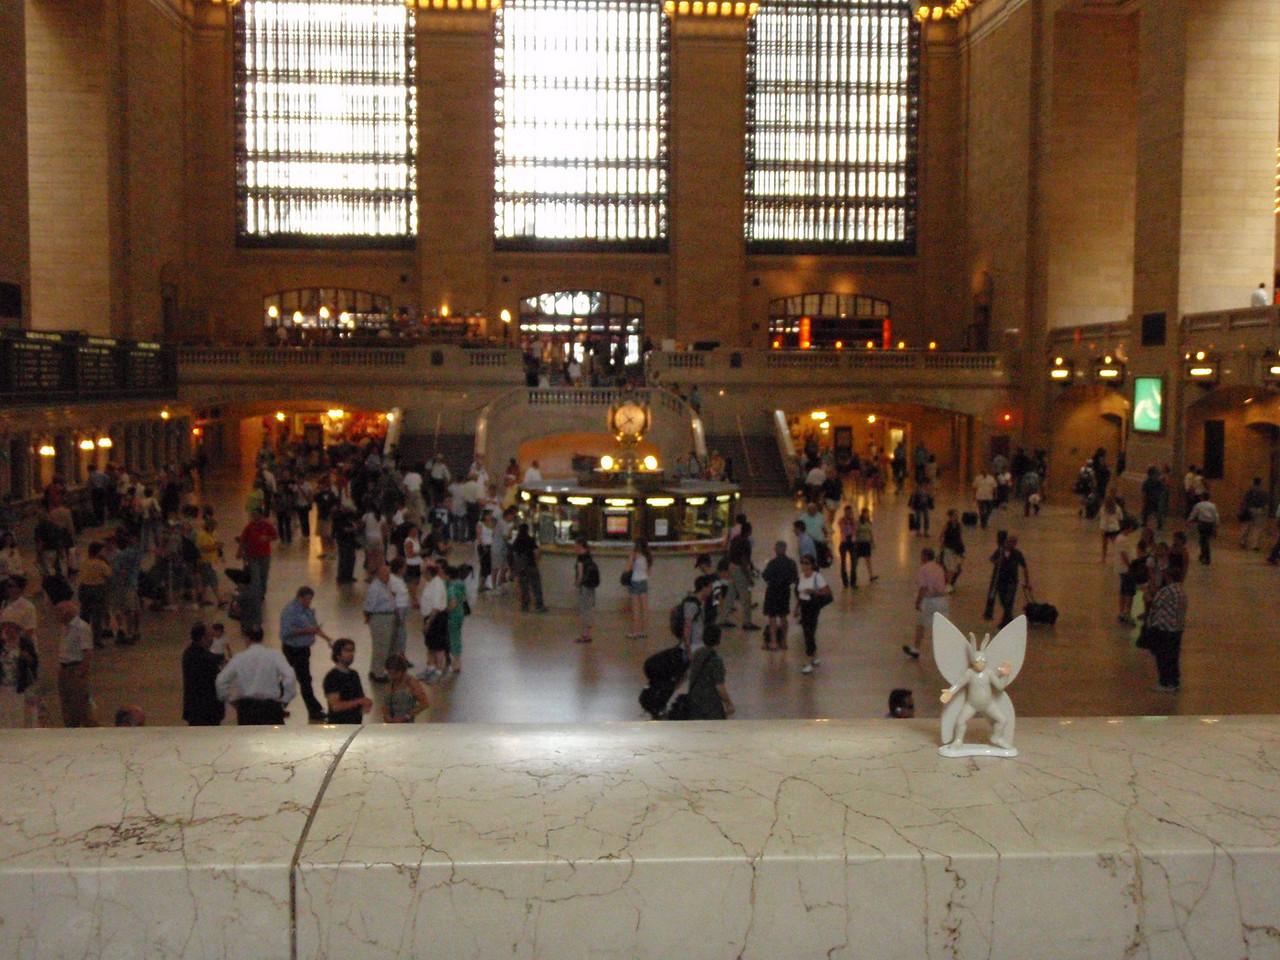 2008-06-09 Grand Central Station